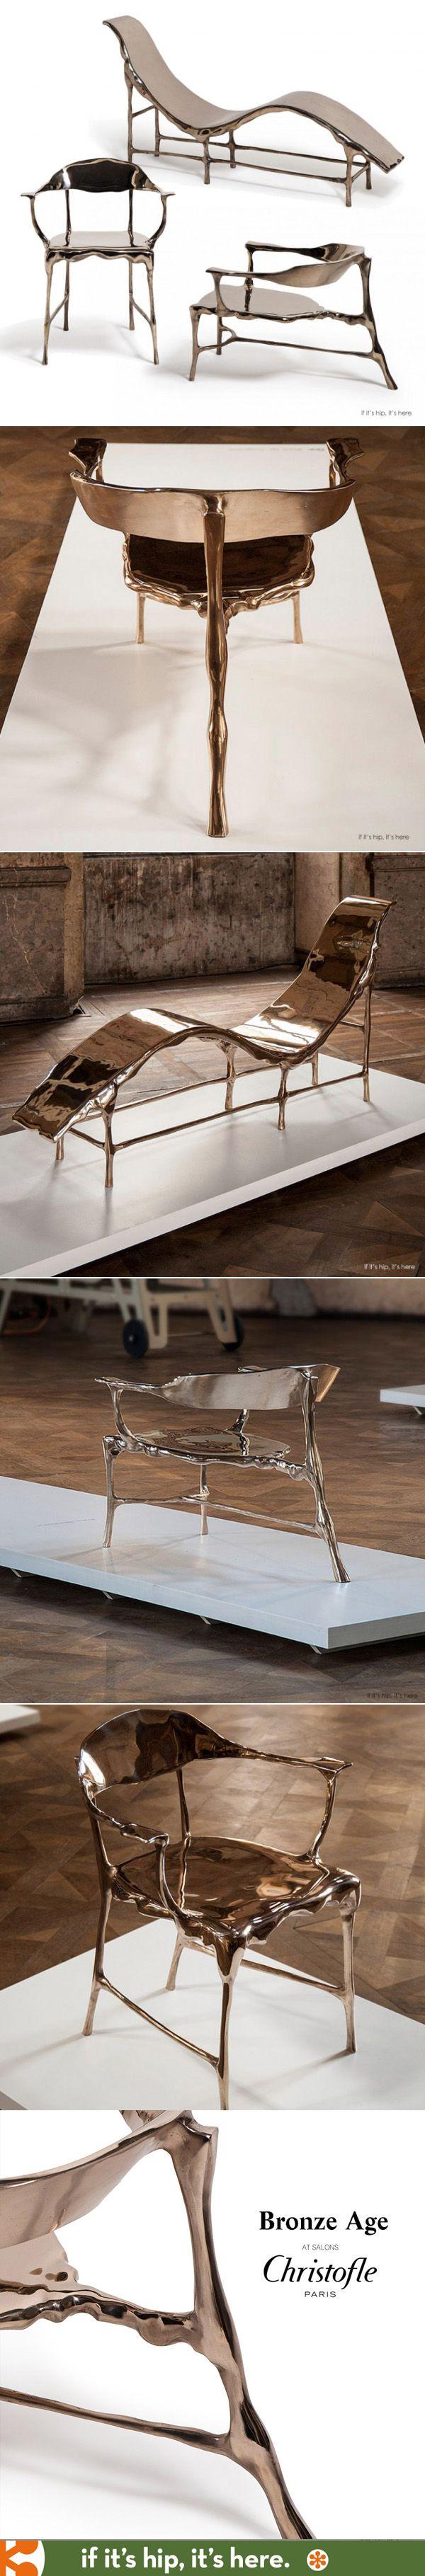 e9ff6ee32f7862de400aa7956b2c41b6--vision-spring--trends Incroyable De Table Basse Le Corbusier Concept